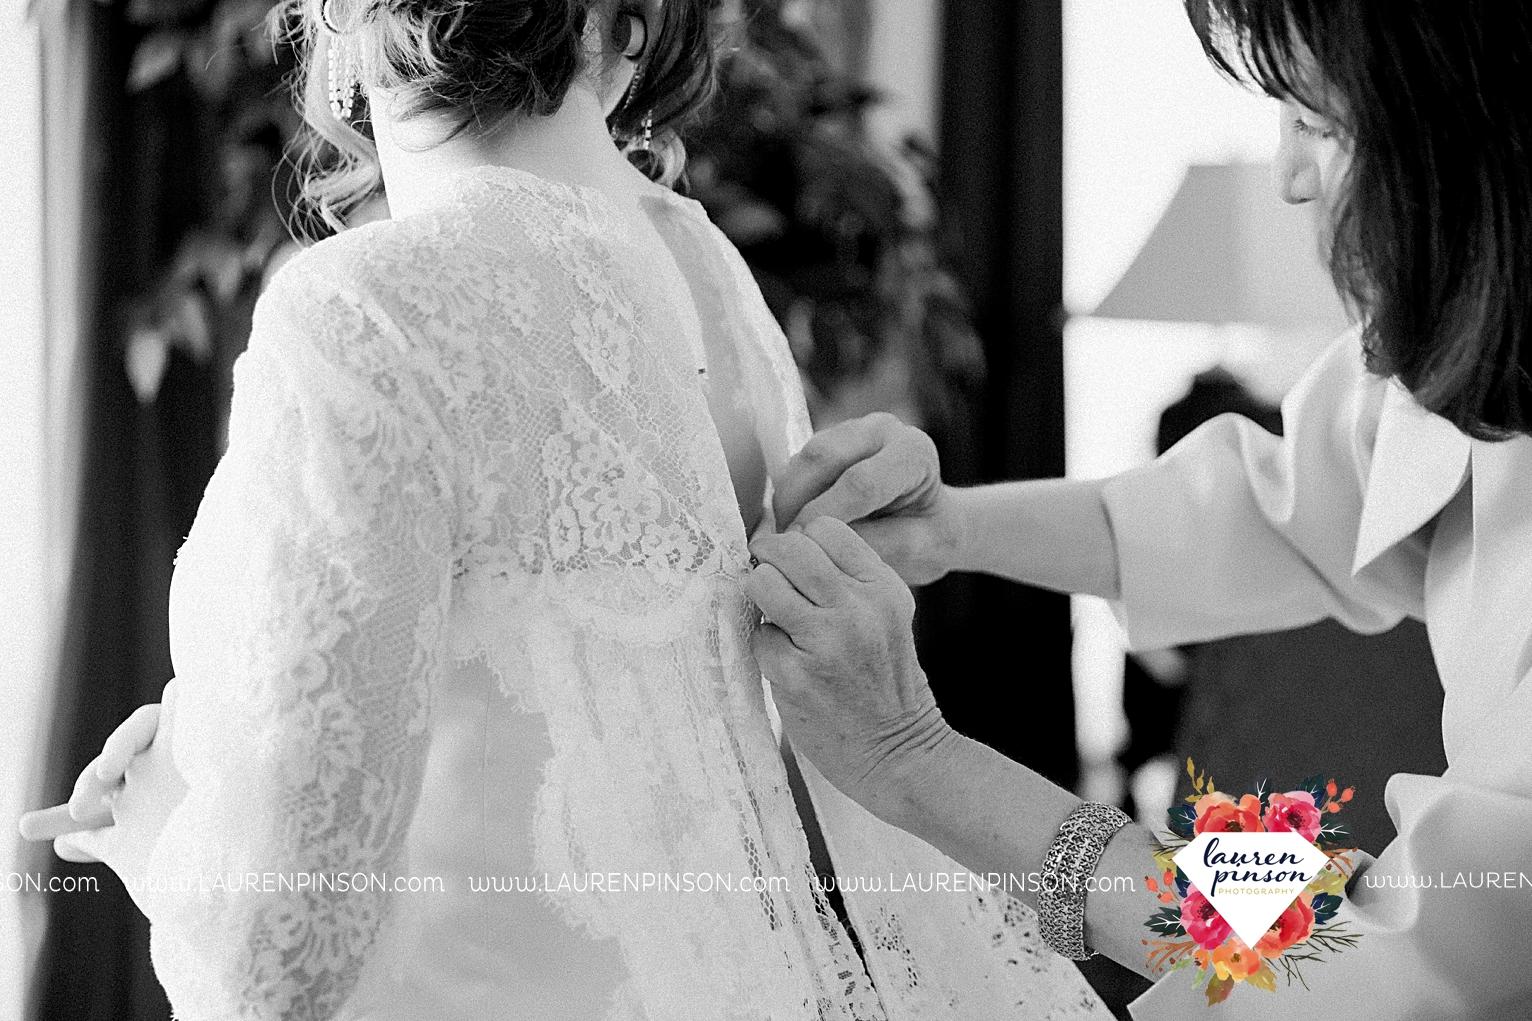 wichita-falls-texas-wedding-photographer-vintage-off-beat-bride-faith-village-church-of-christ-the-plex-roller-skating_2402.jpg